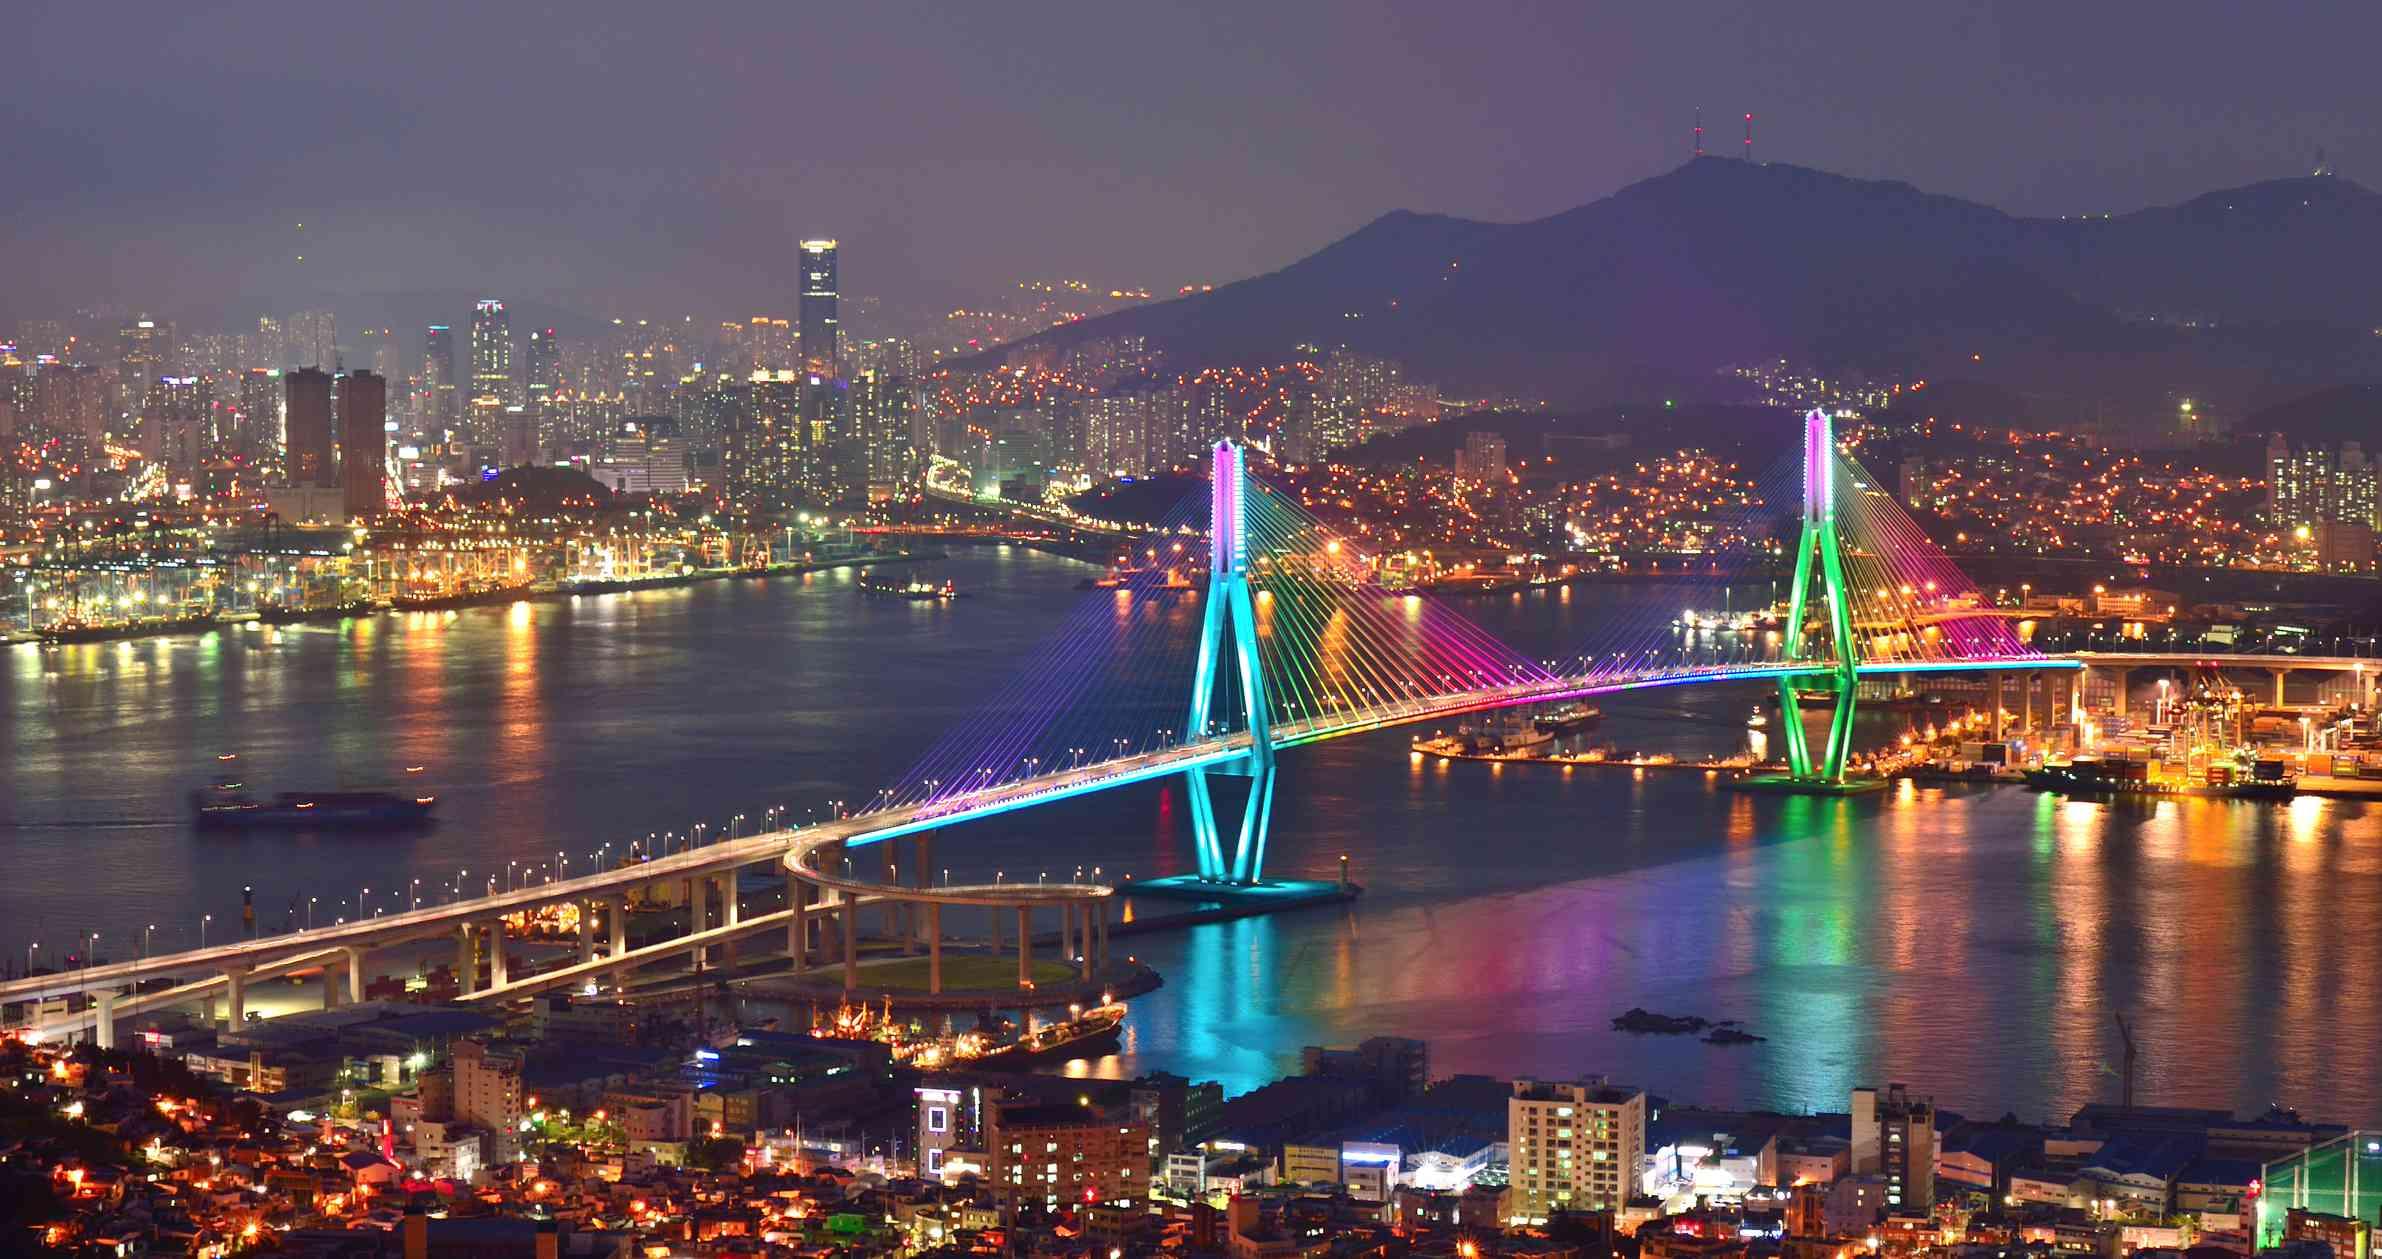 Night view of Busan, South Korea